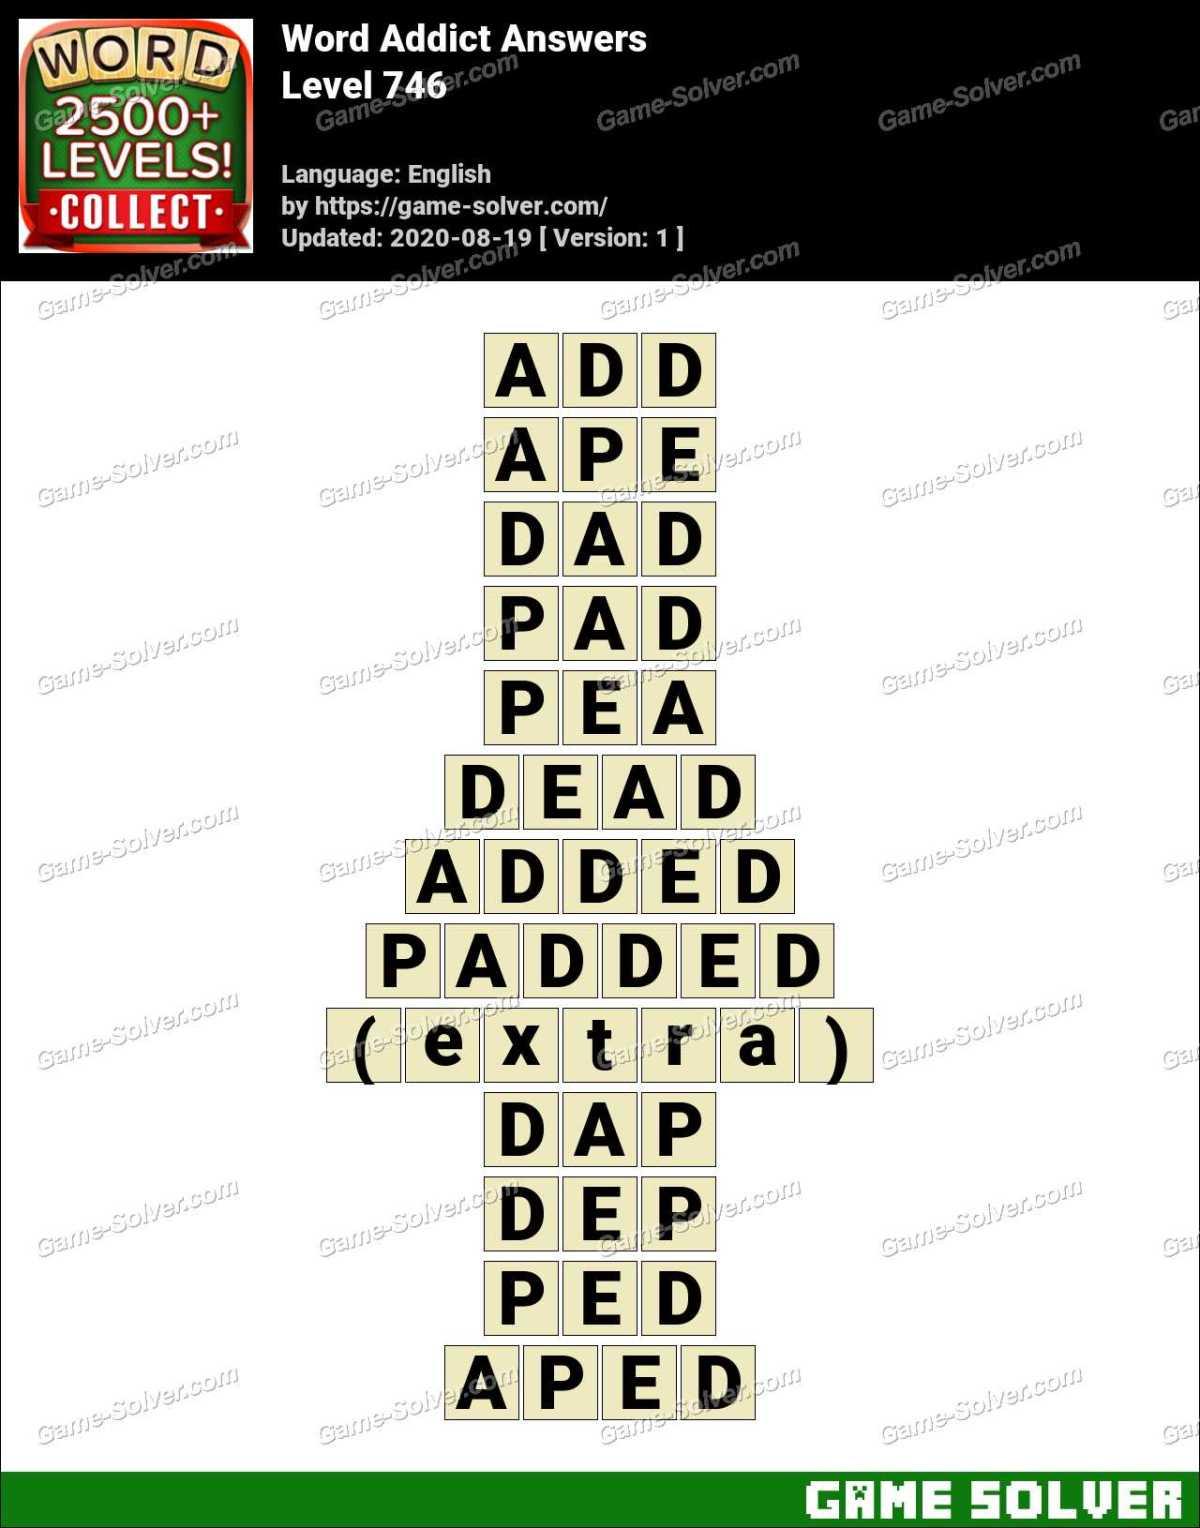 Word Addict Level 746 Answers